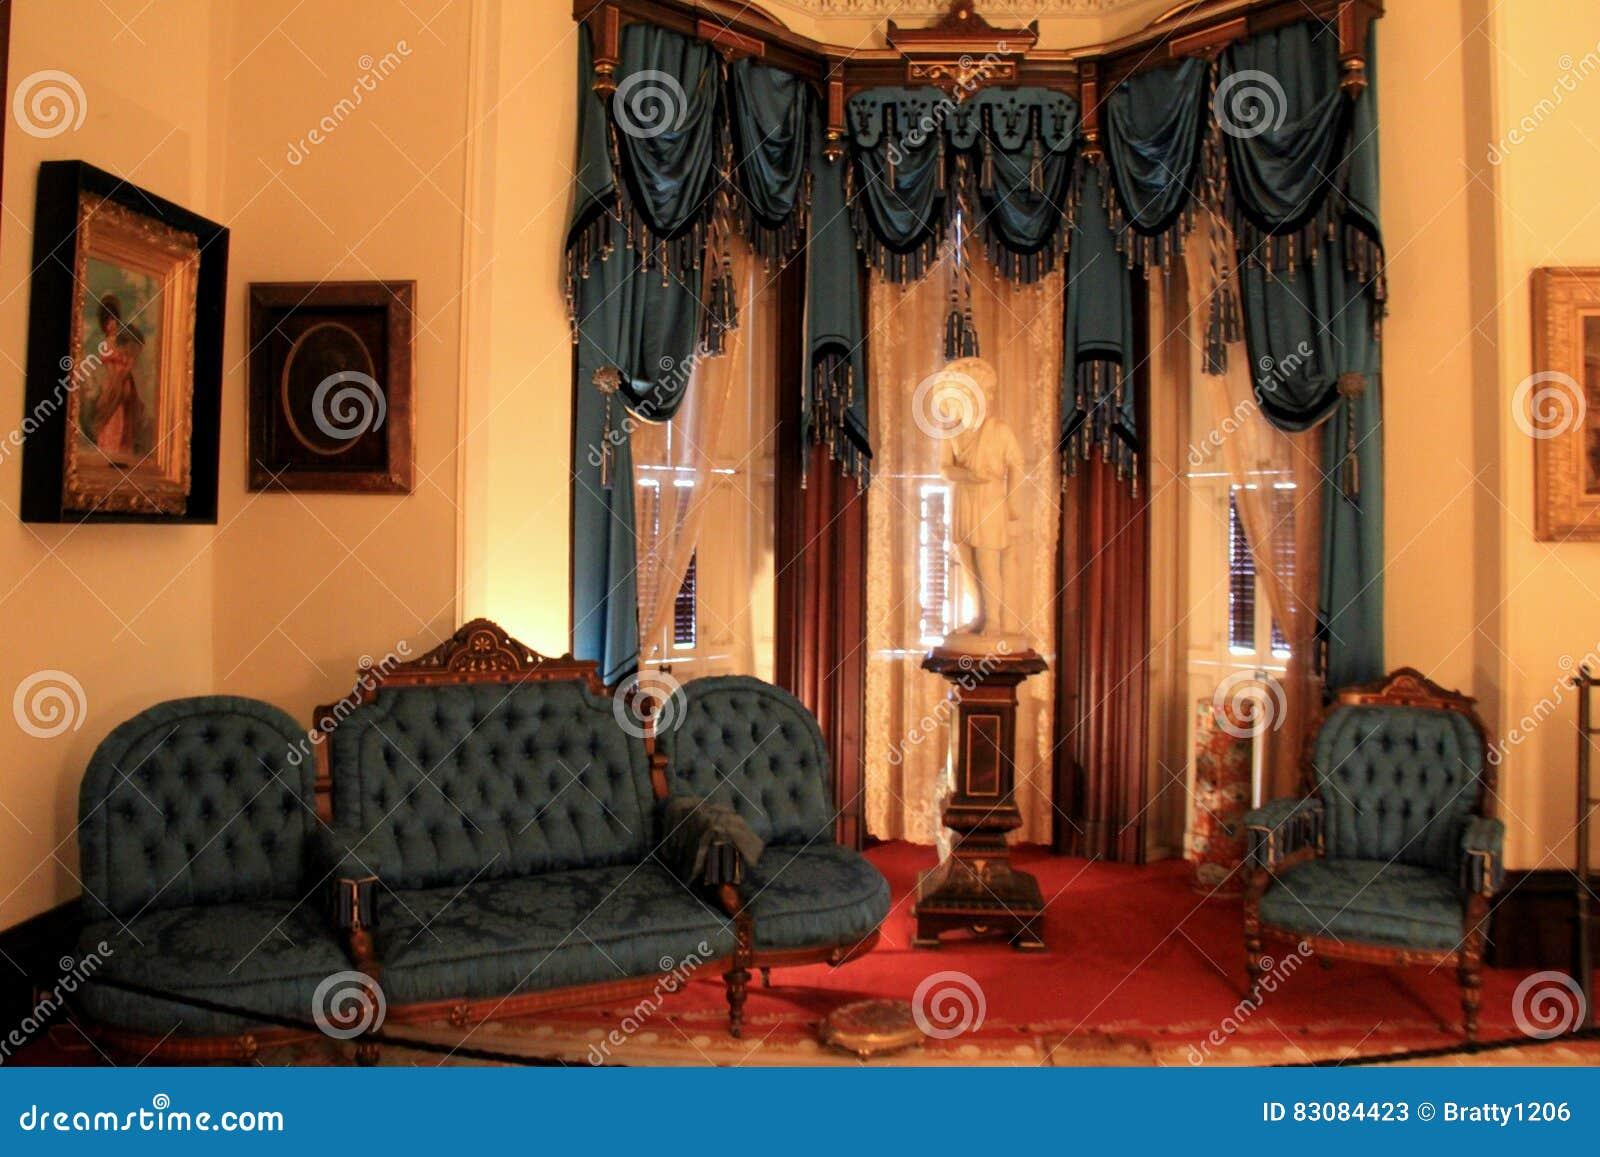 Stunning Interior Architecture And Opulent Furniture, Historic Richard Bates  House, Oswego, New York